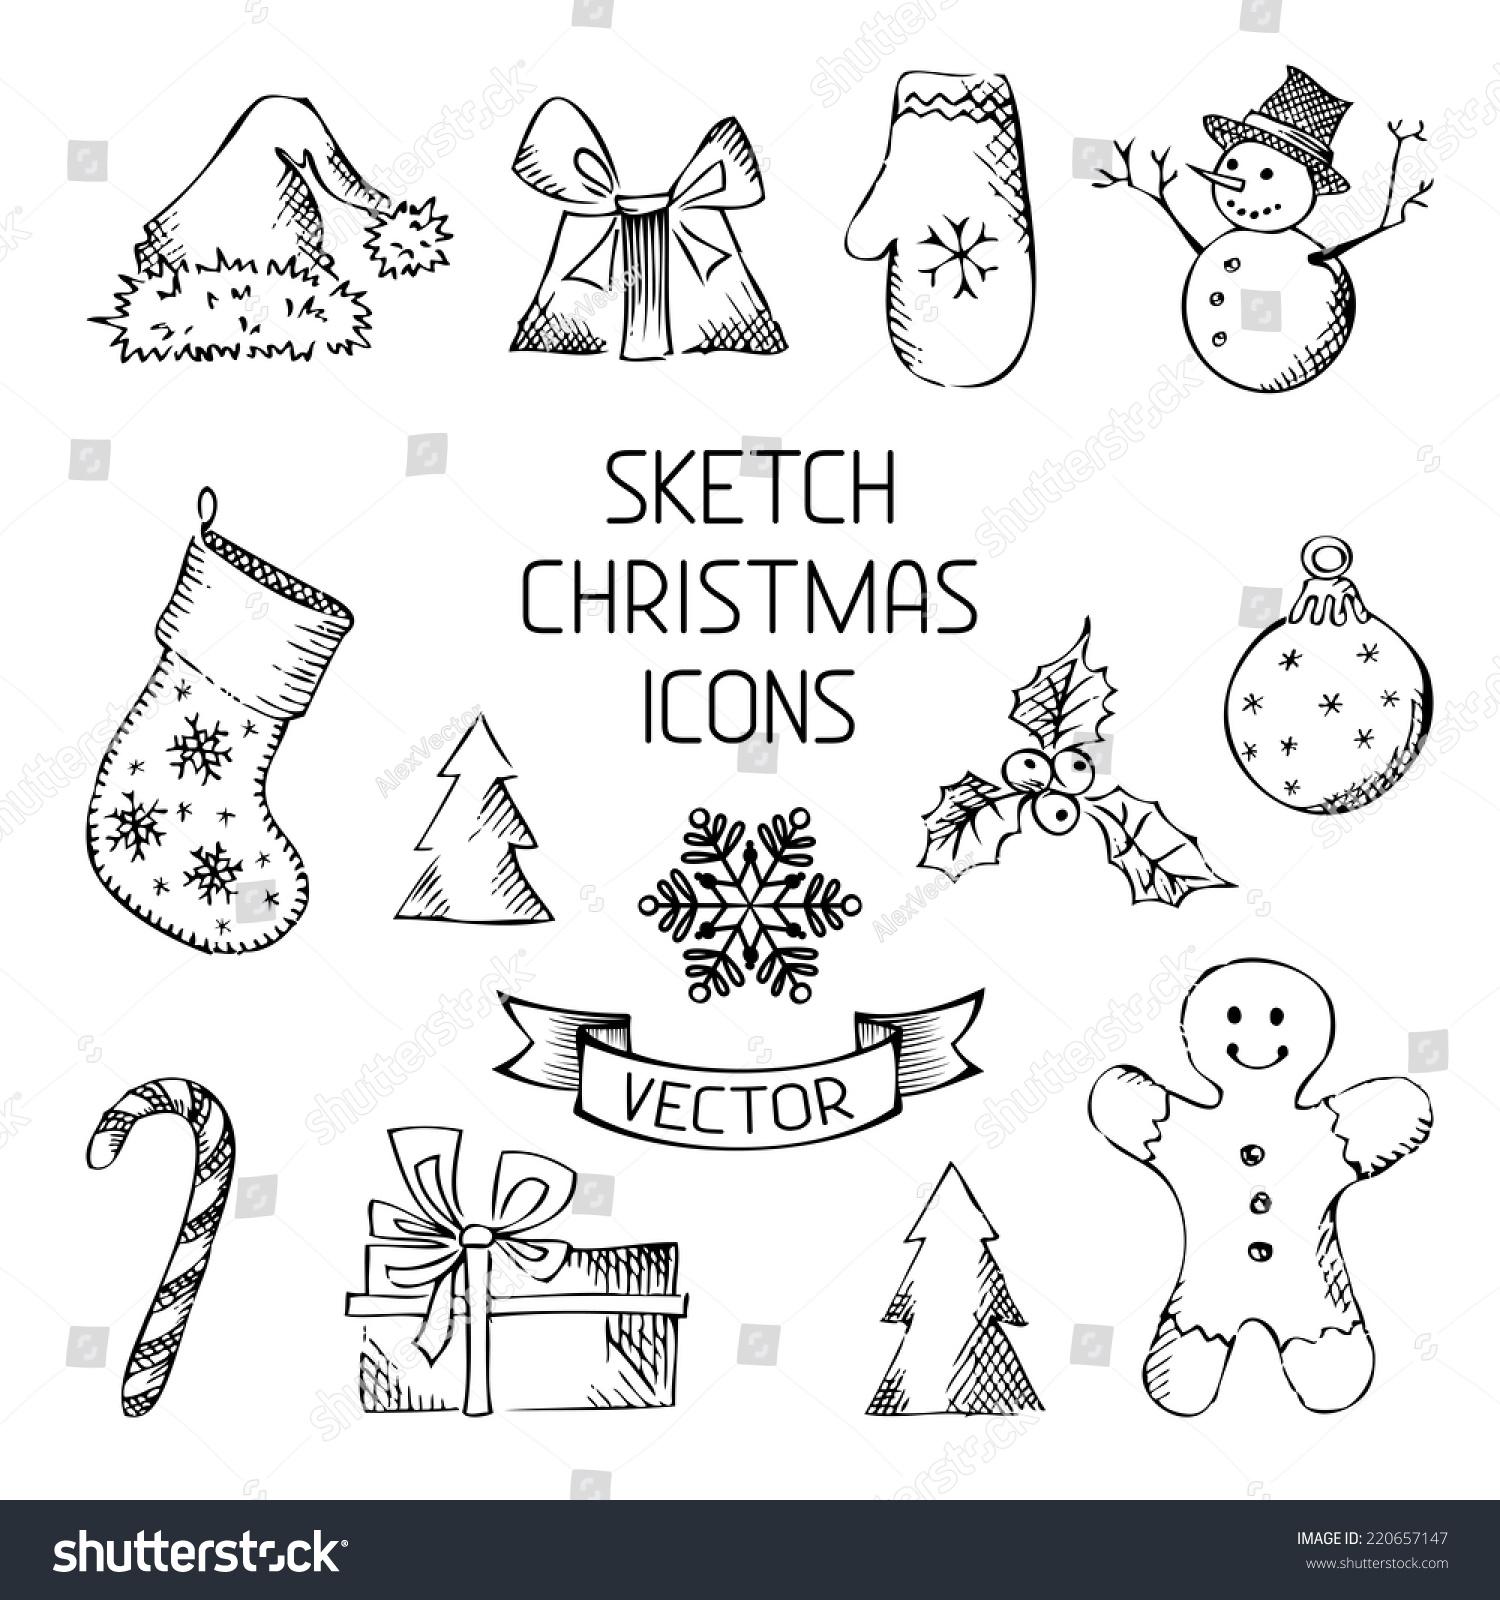 Handdrawn Christmas Icons Sketch Pencil Christmas Stock ...